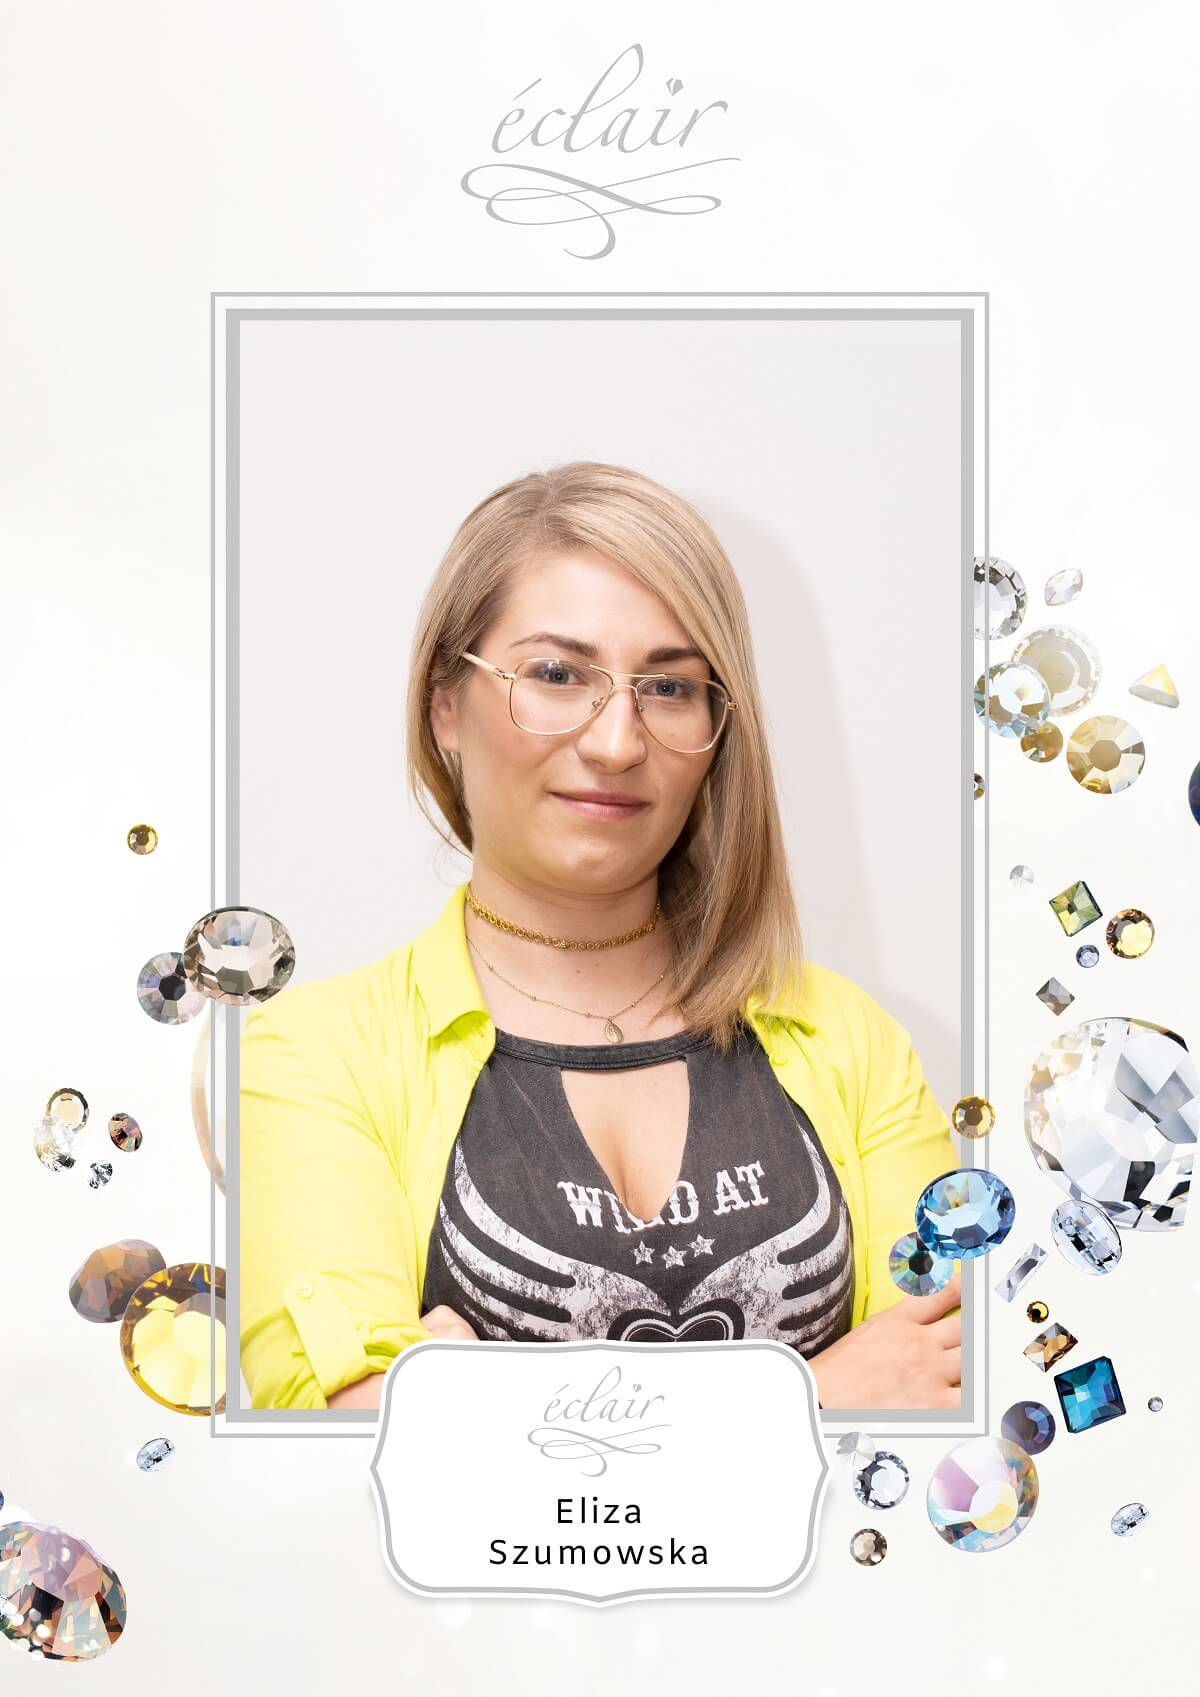 Eliza Szumowska Educaktor Marki Eclair